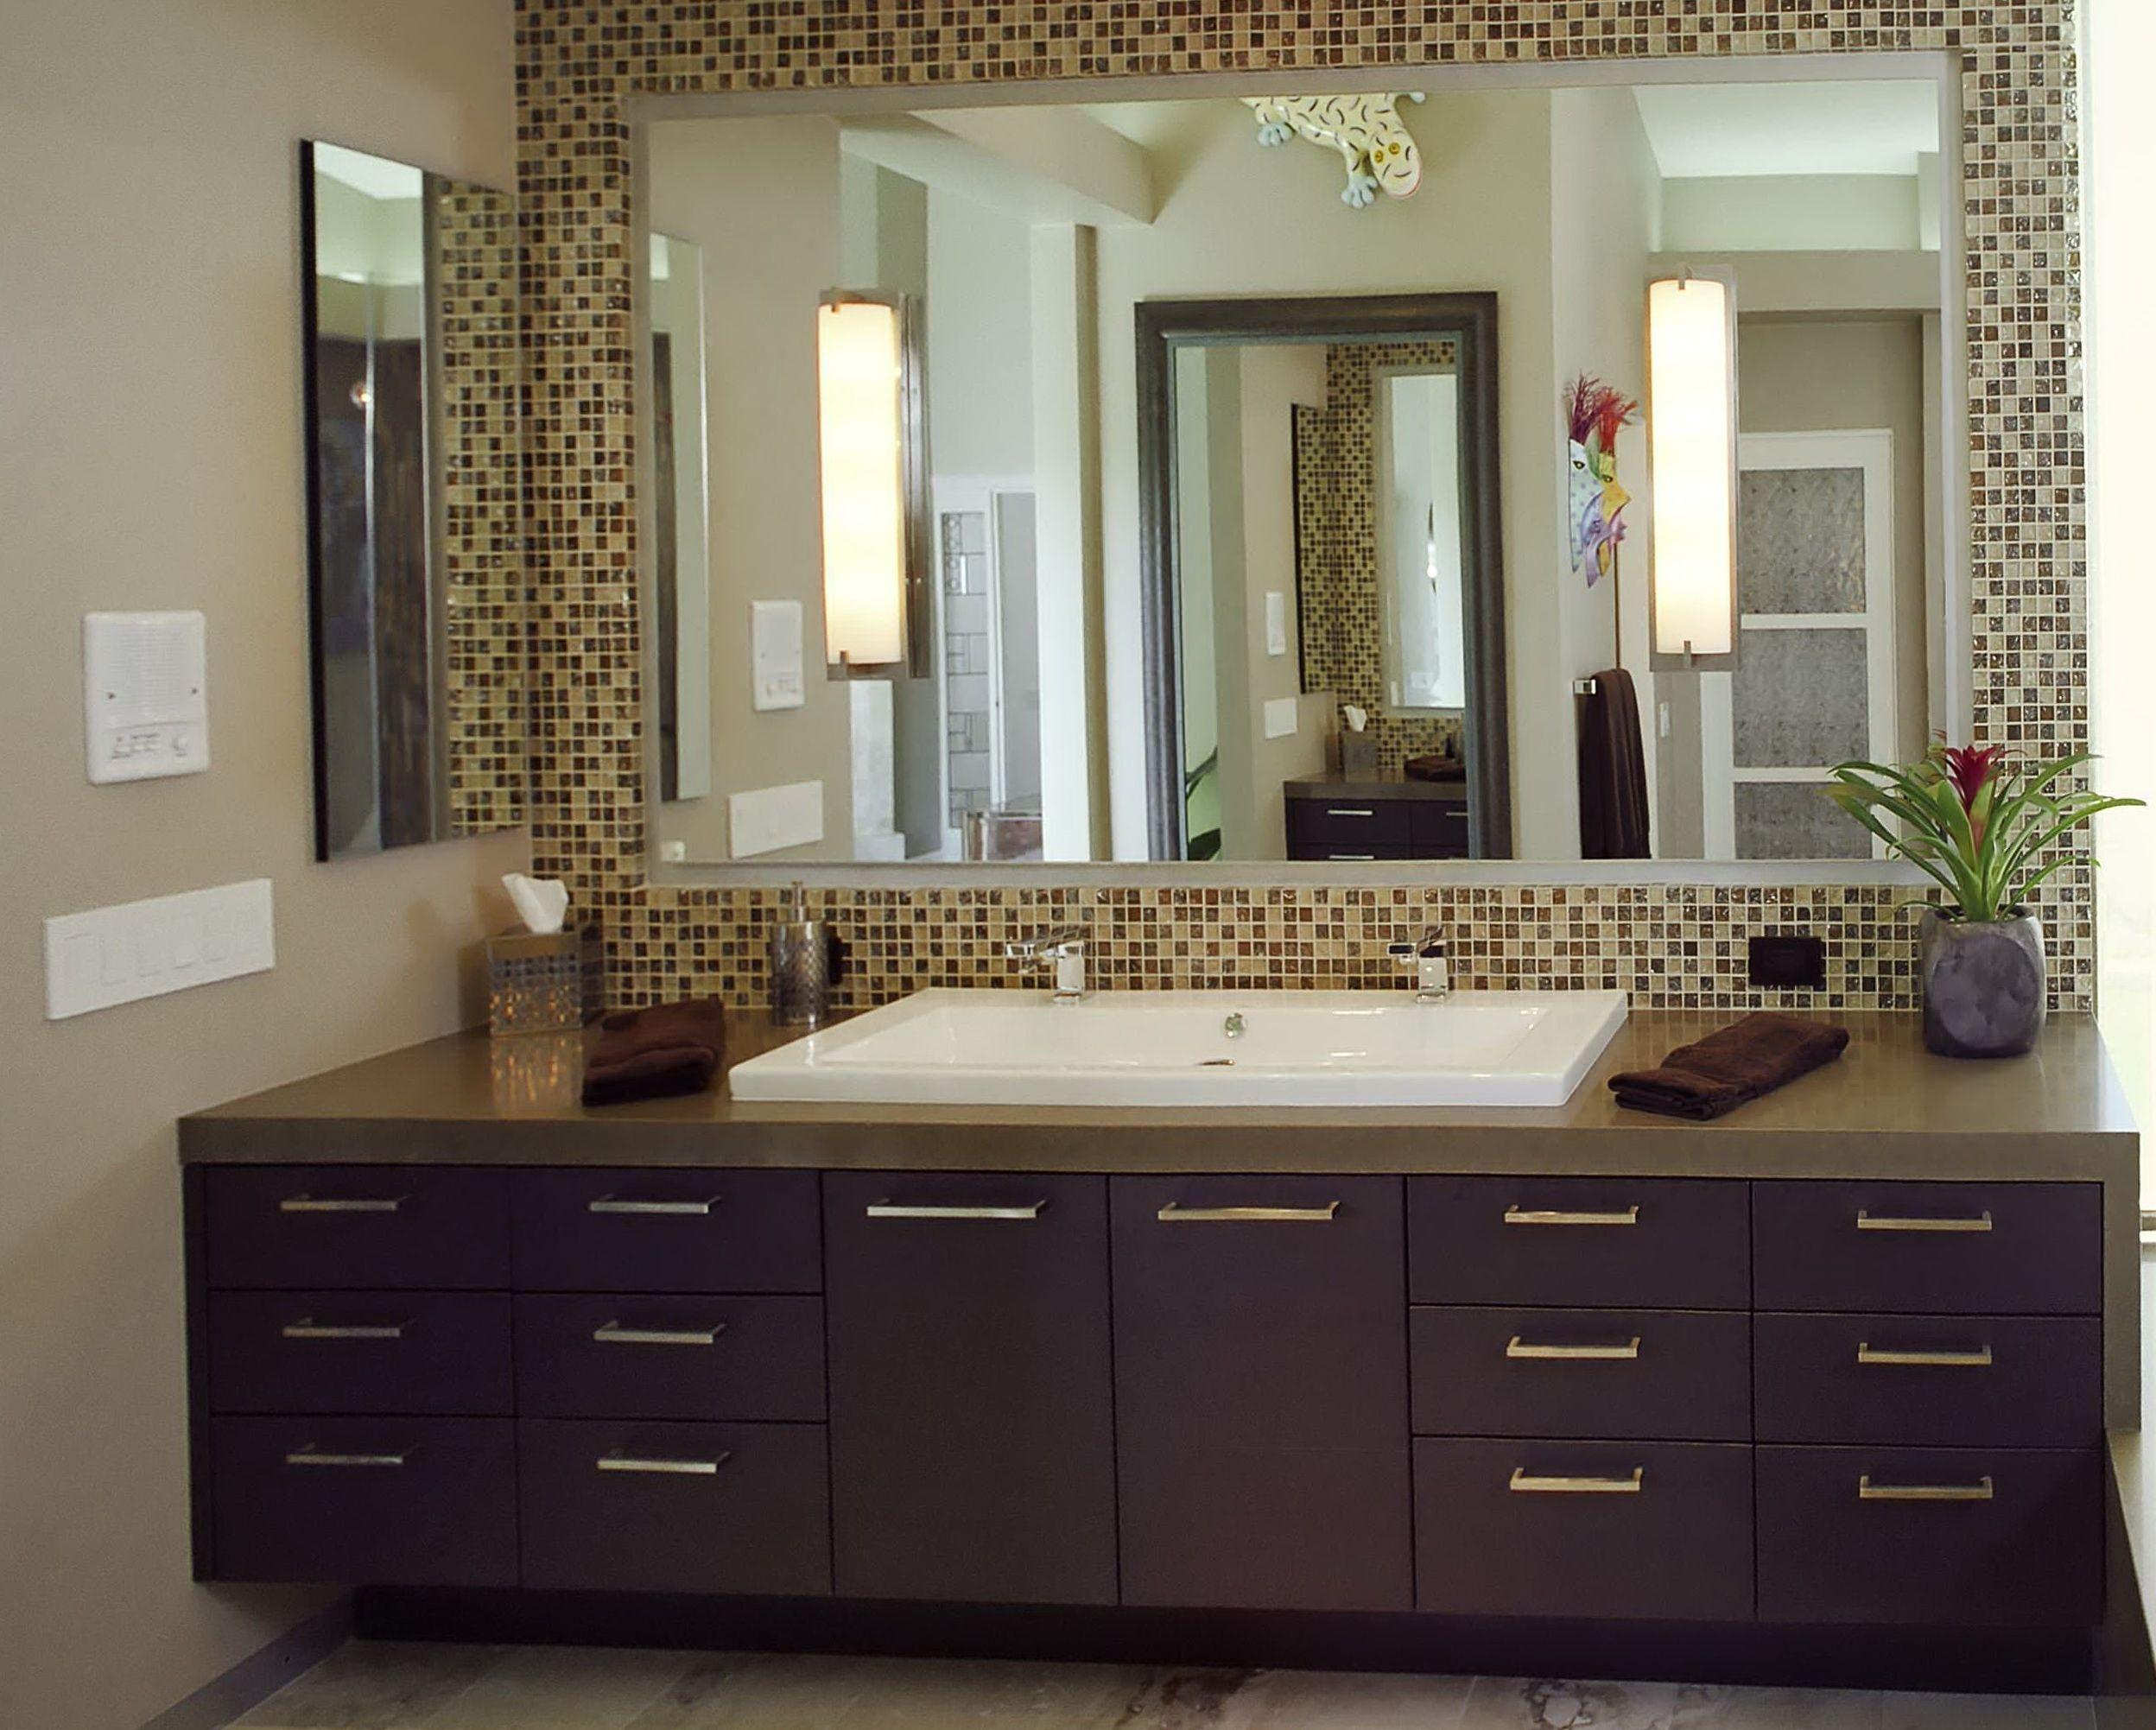 23 Fancy Framed Bathroom Mirrors Contemporary Bathrooms Sink